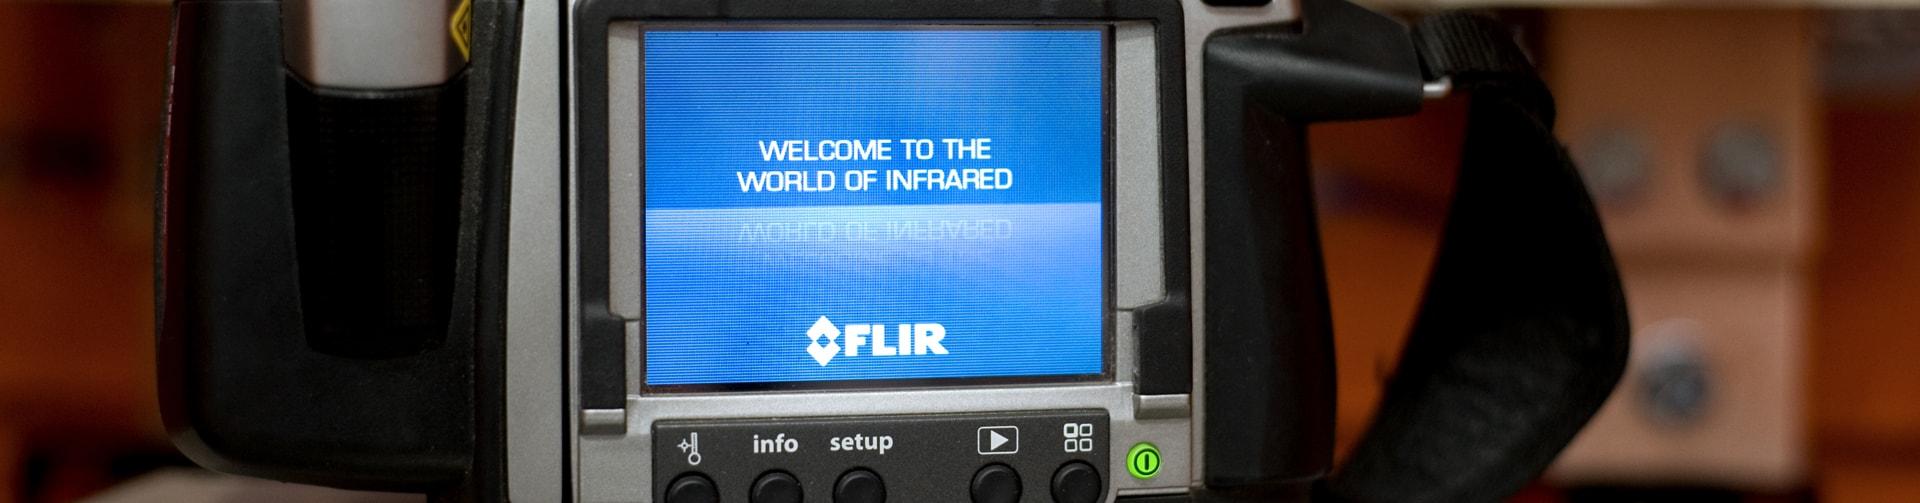 Flir Thermographic Camera